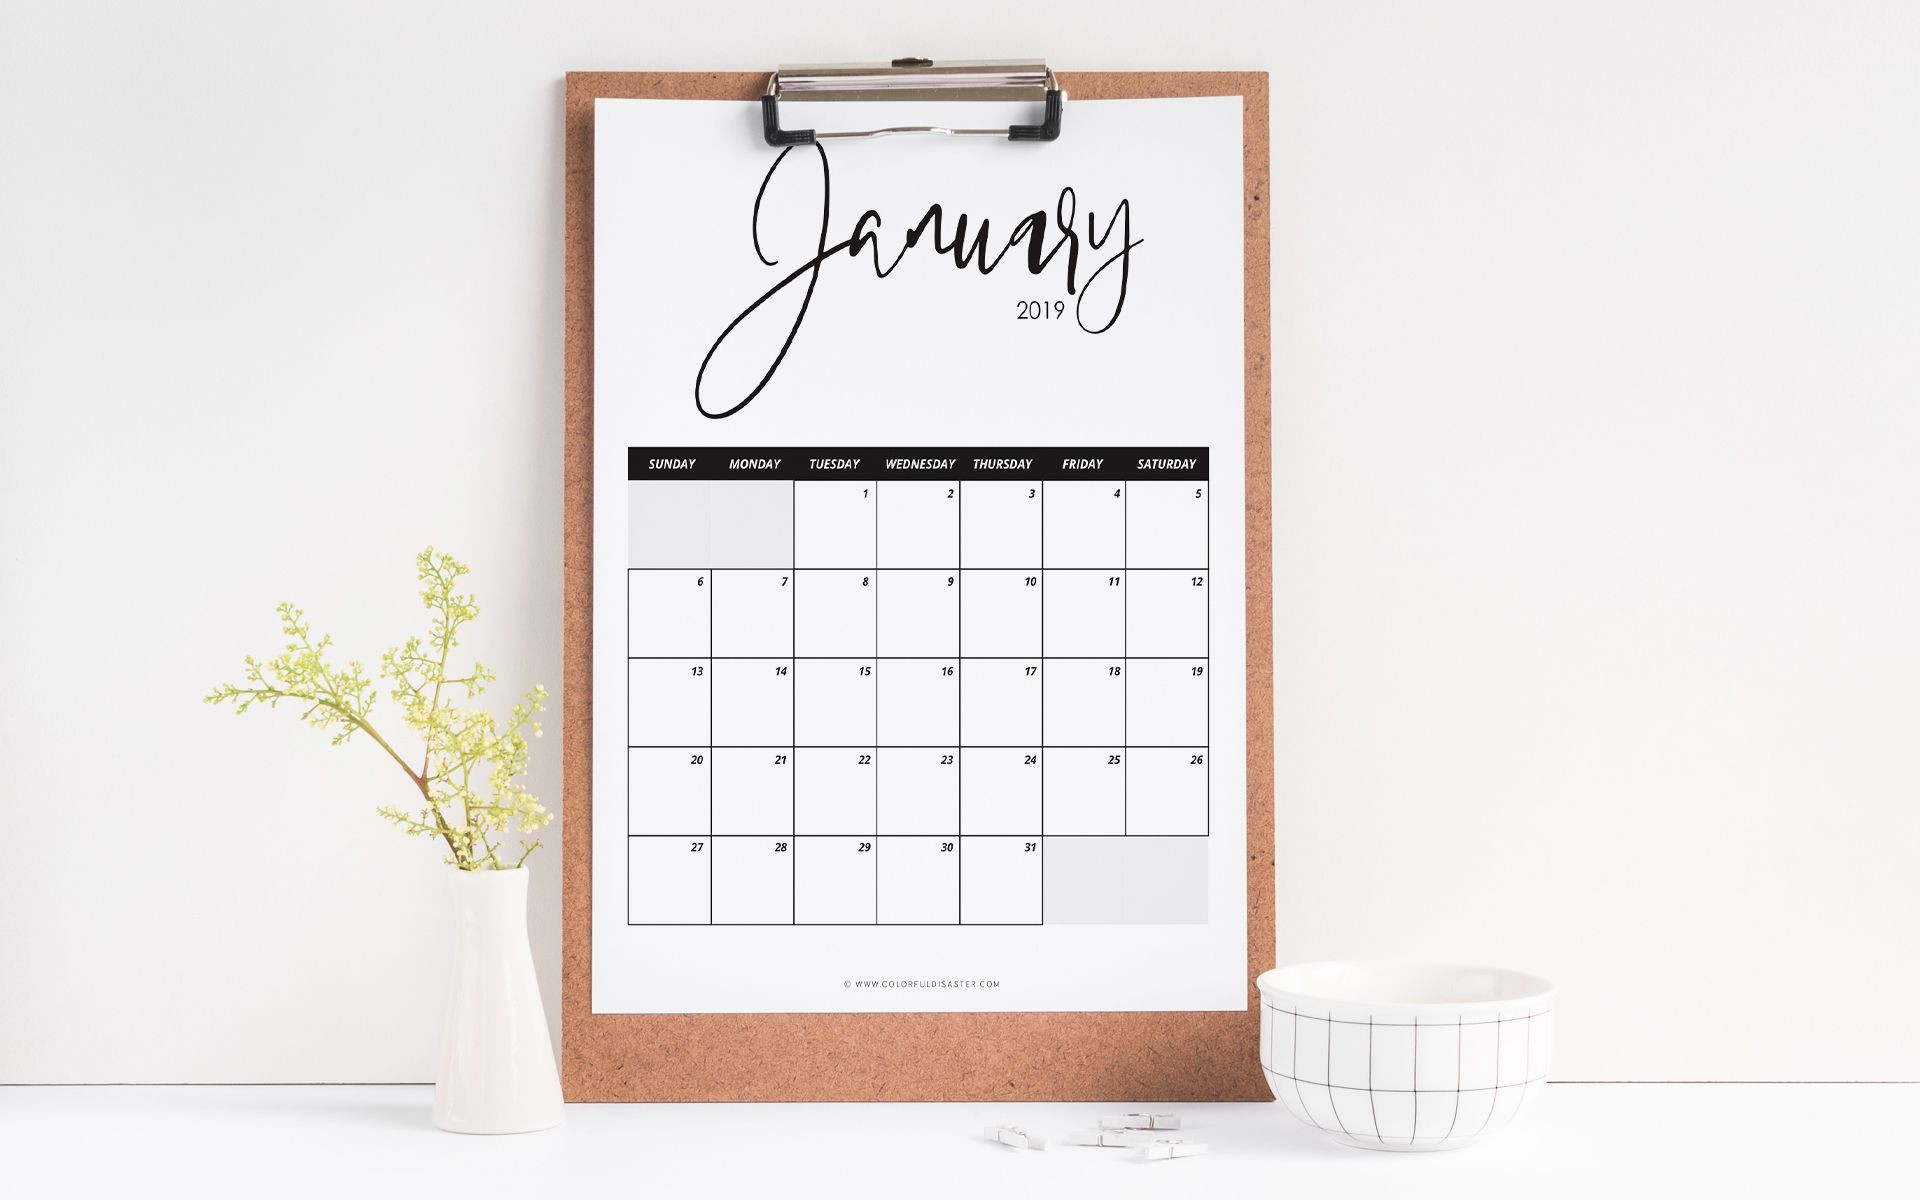 January 2019 Calendar Planner Más Actual 10 Stylish Free Printable Calendars for 2019 Of January 2019 Calendar Planner Más Caliente Custom Editable Free Printable 2019 Calendars